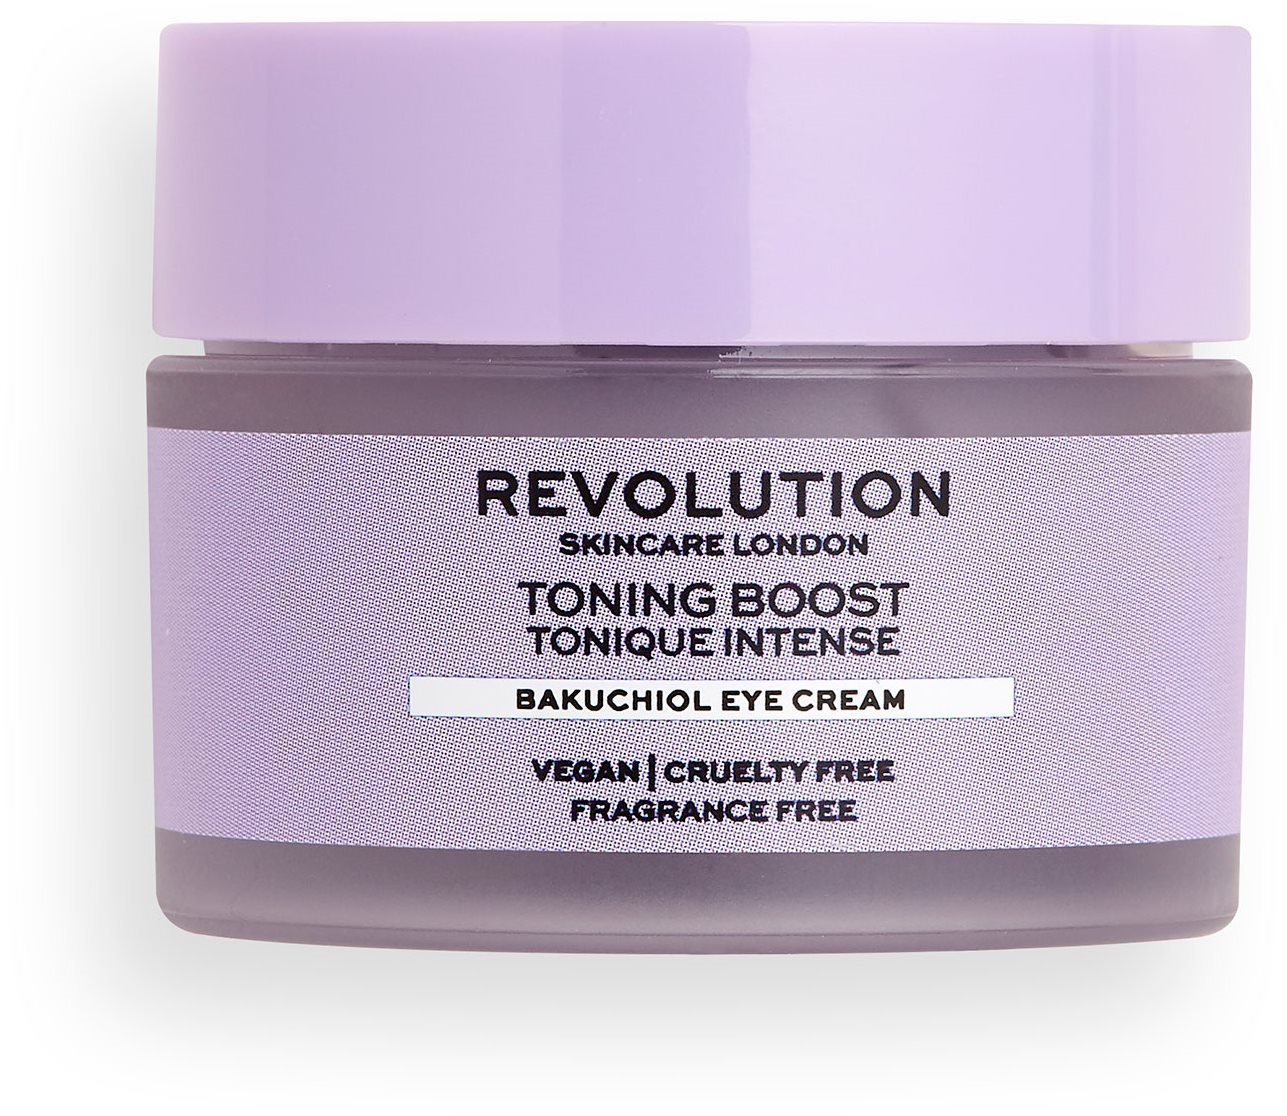 REVOLUTION SKINCARE Toning Boost Bakuchiol 15 ml